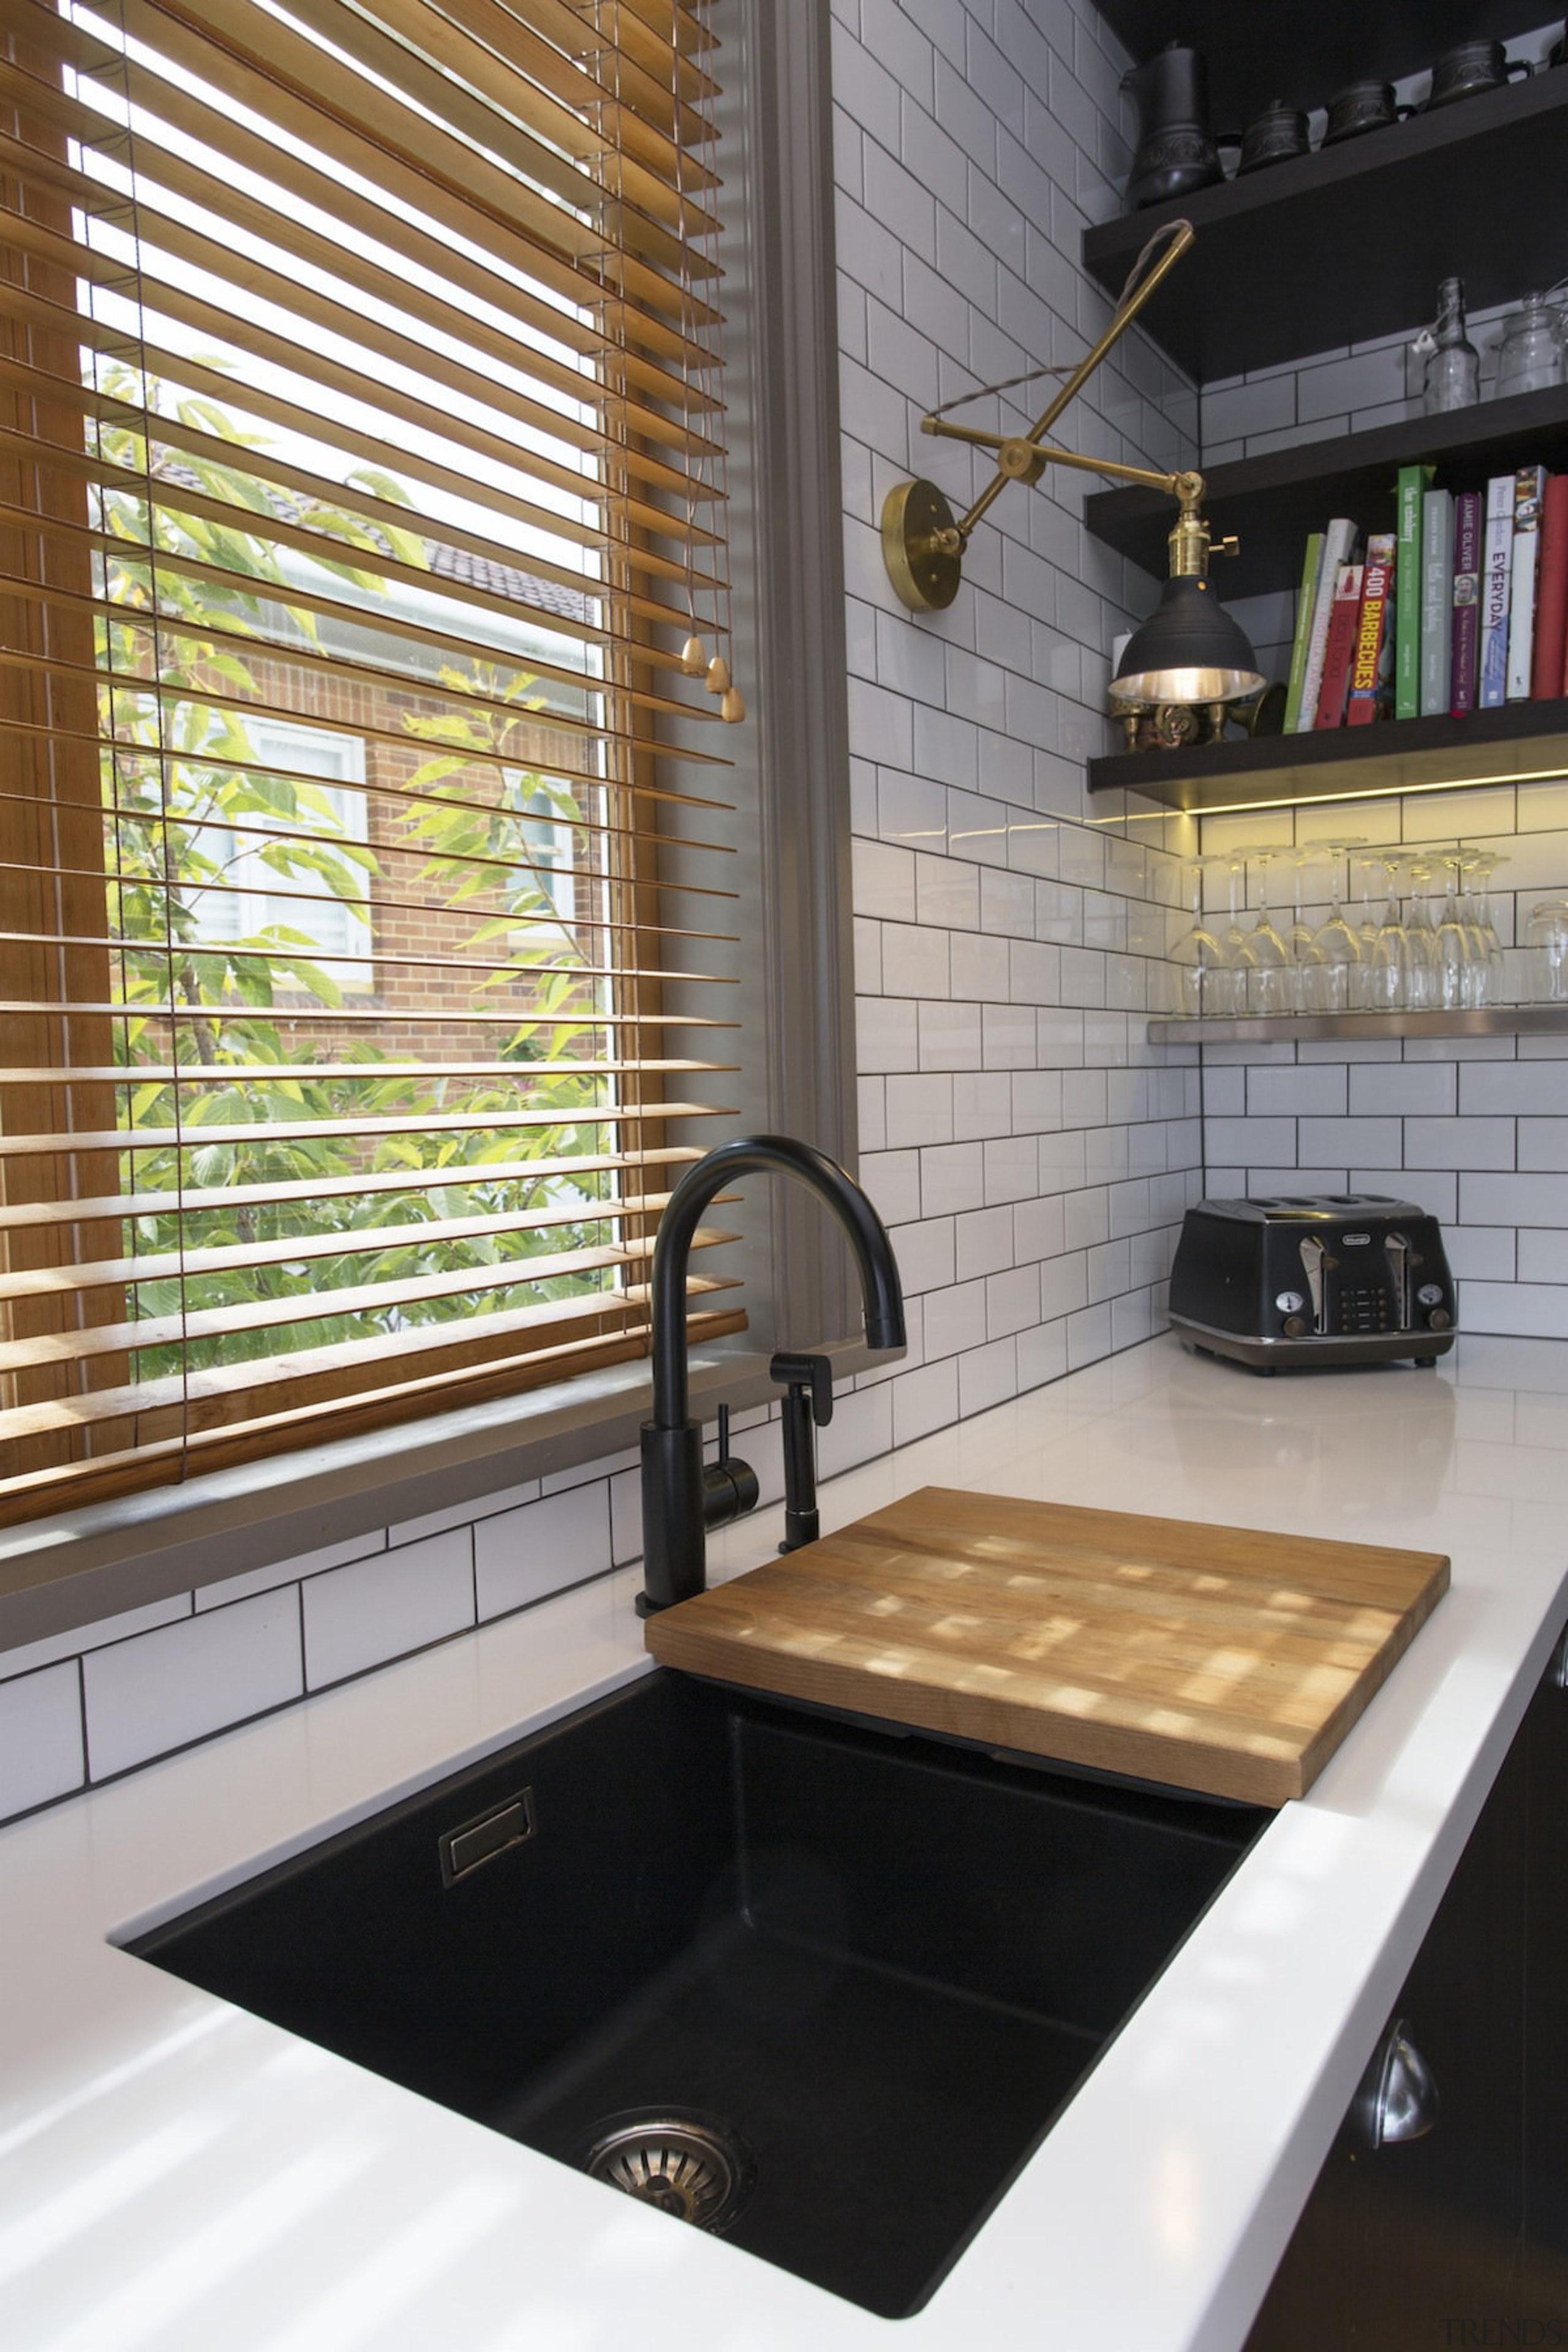 Easy food prep with a breadboard - Easy bathroom, countertop, flooring, interior design, kitchen, room, sink, tile, gray